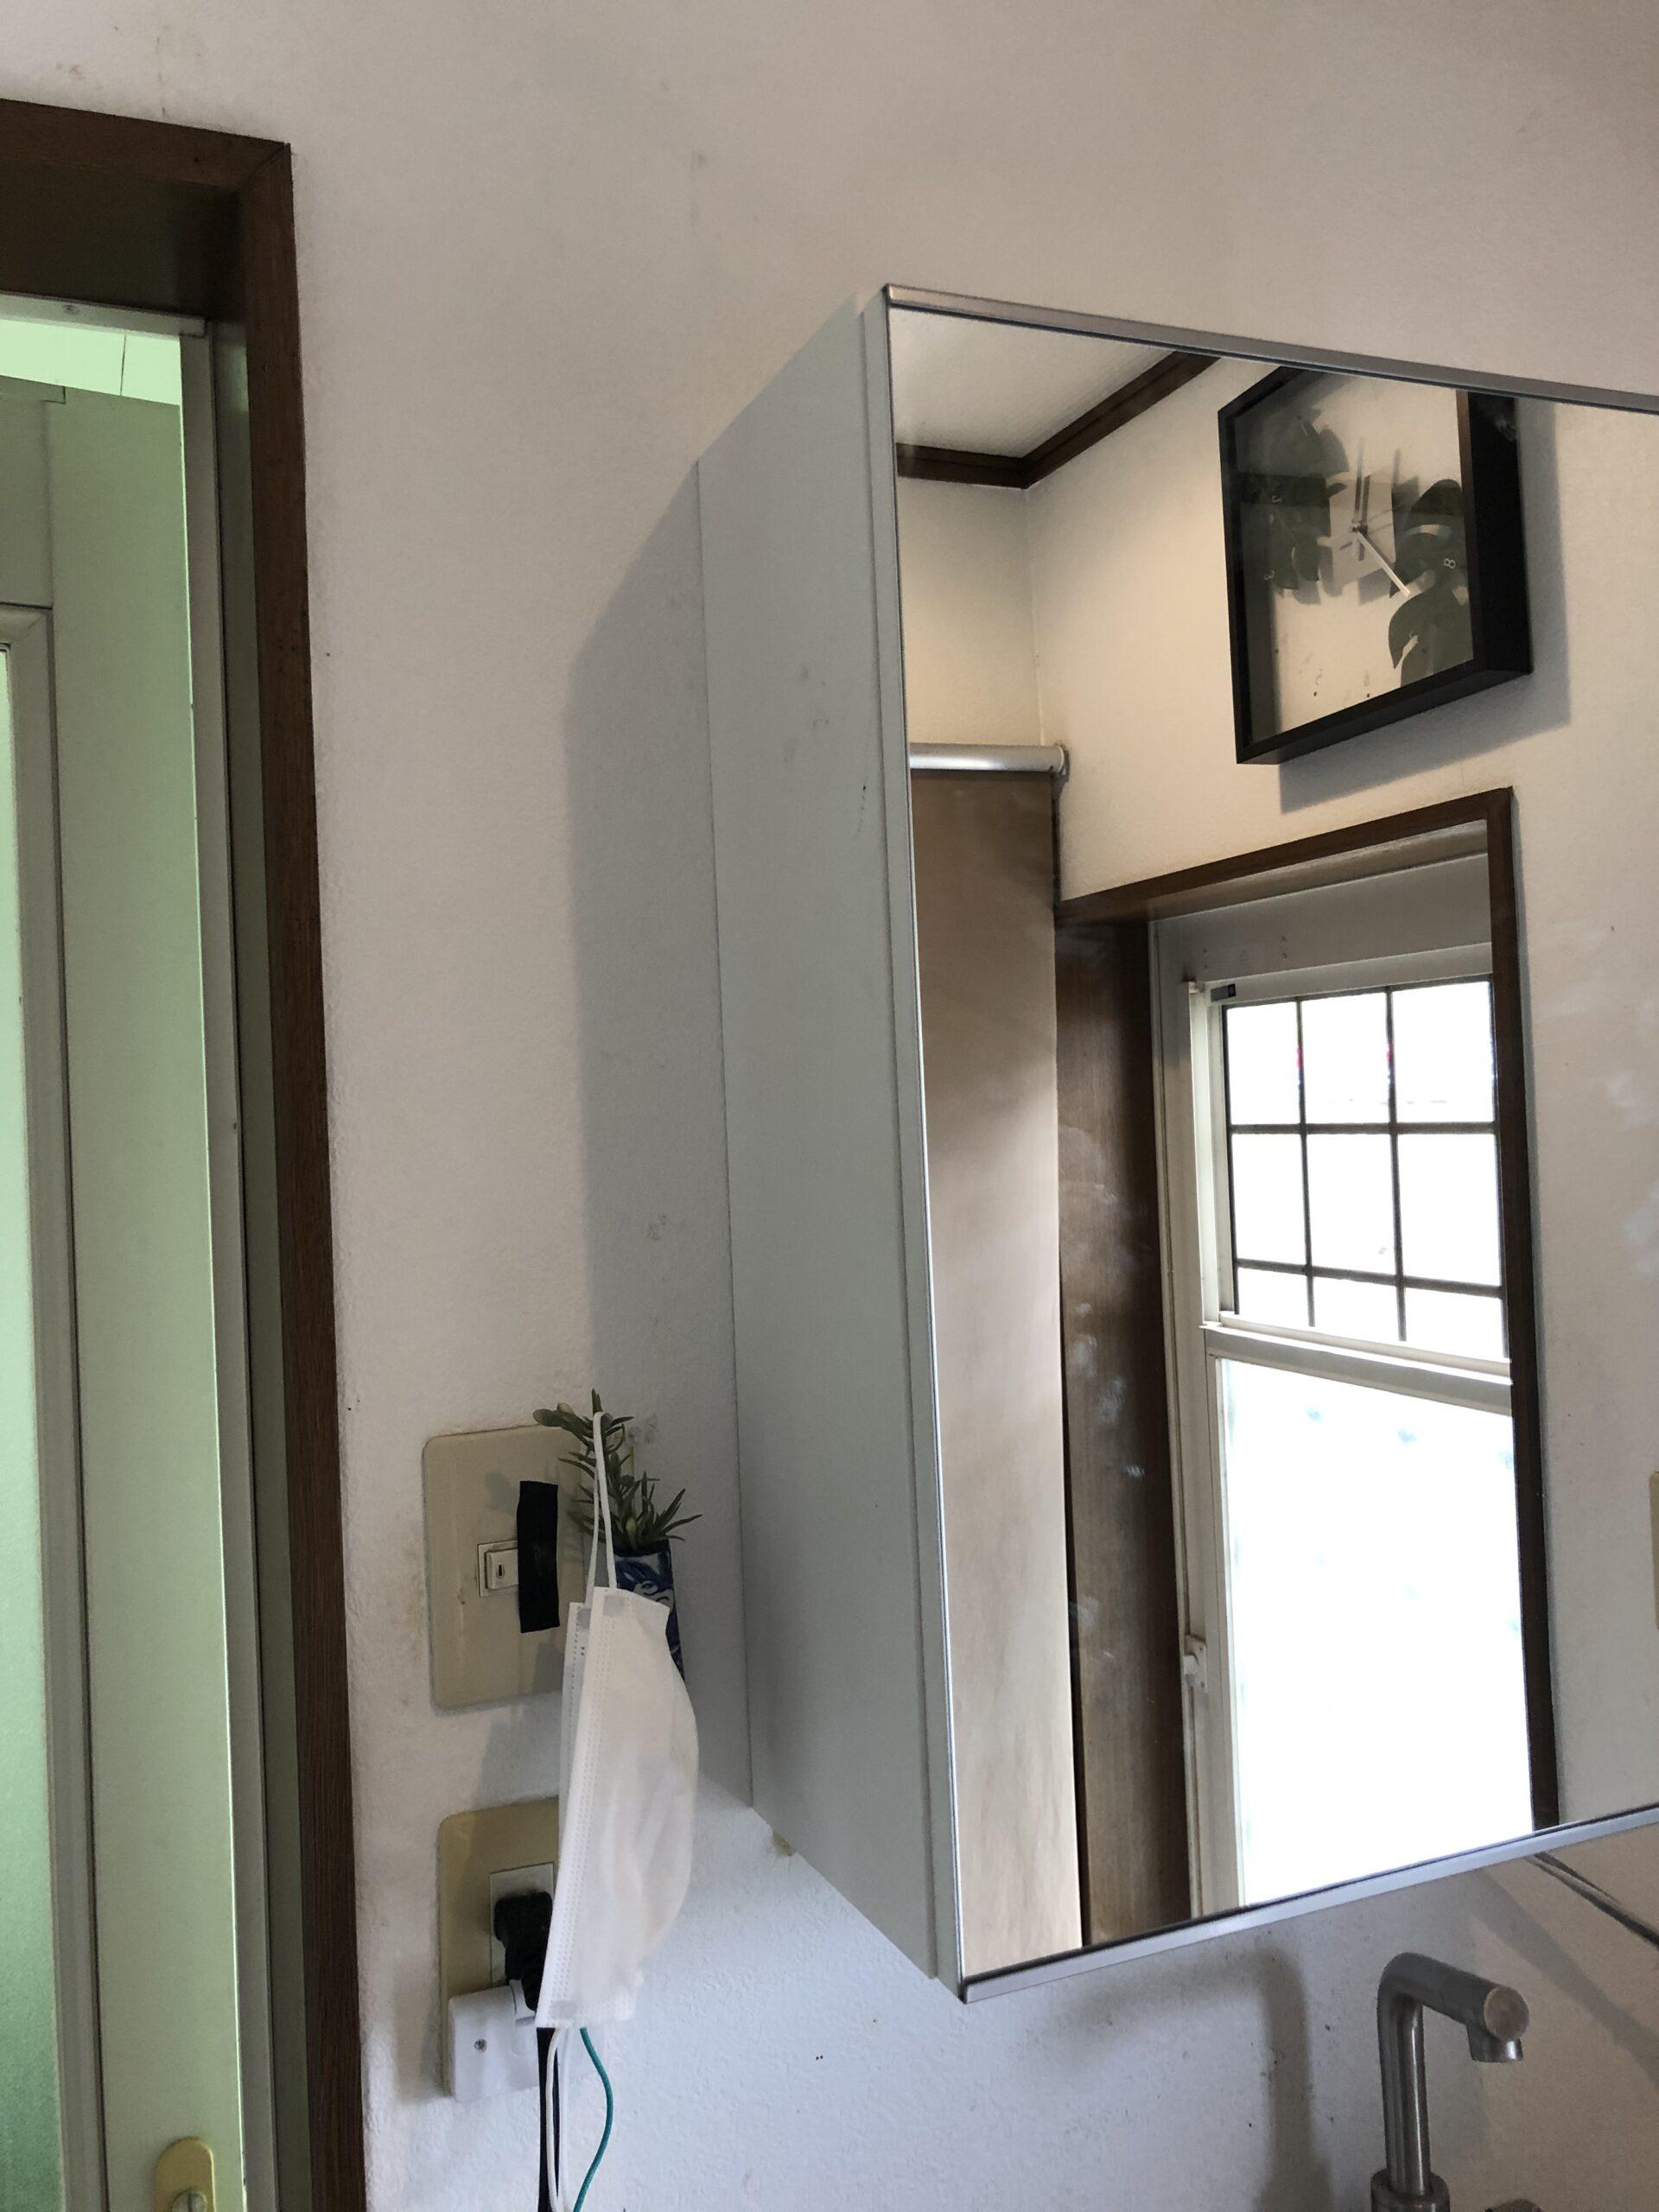 洗面収納棚壁面取り付け画像